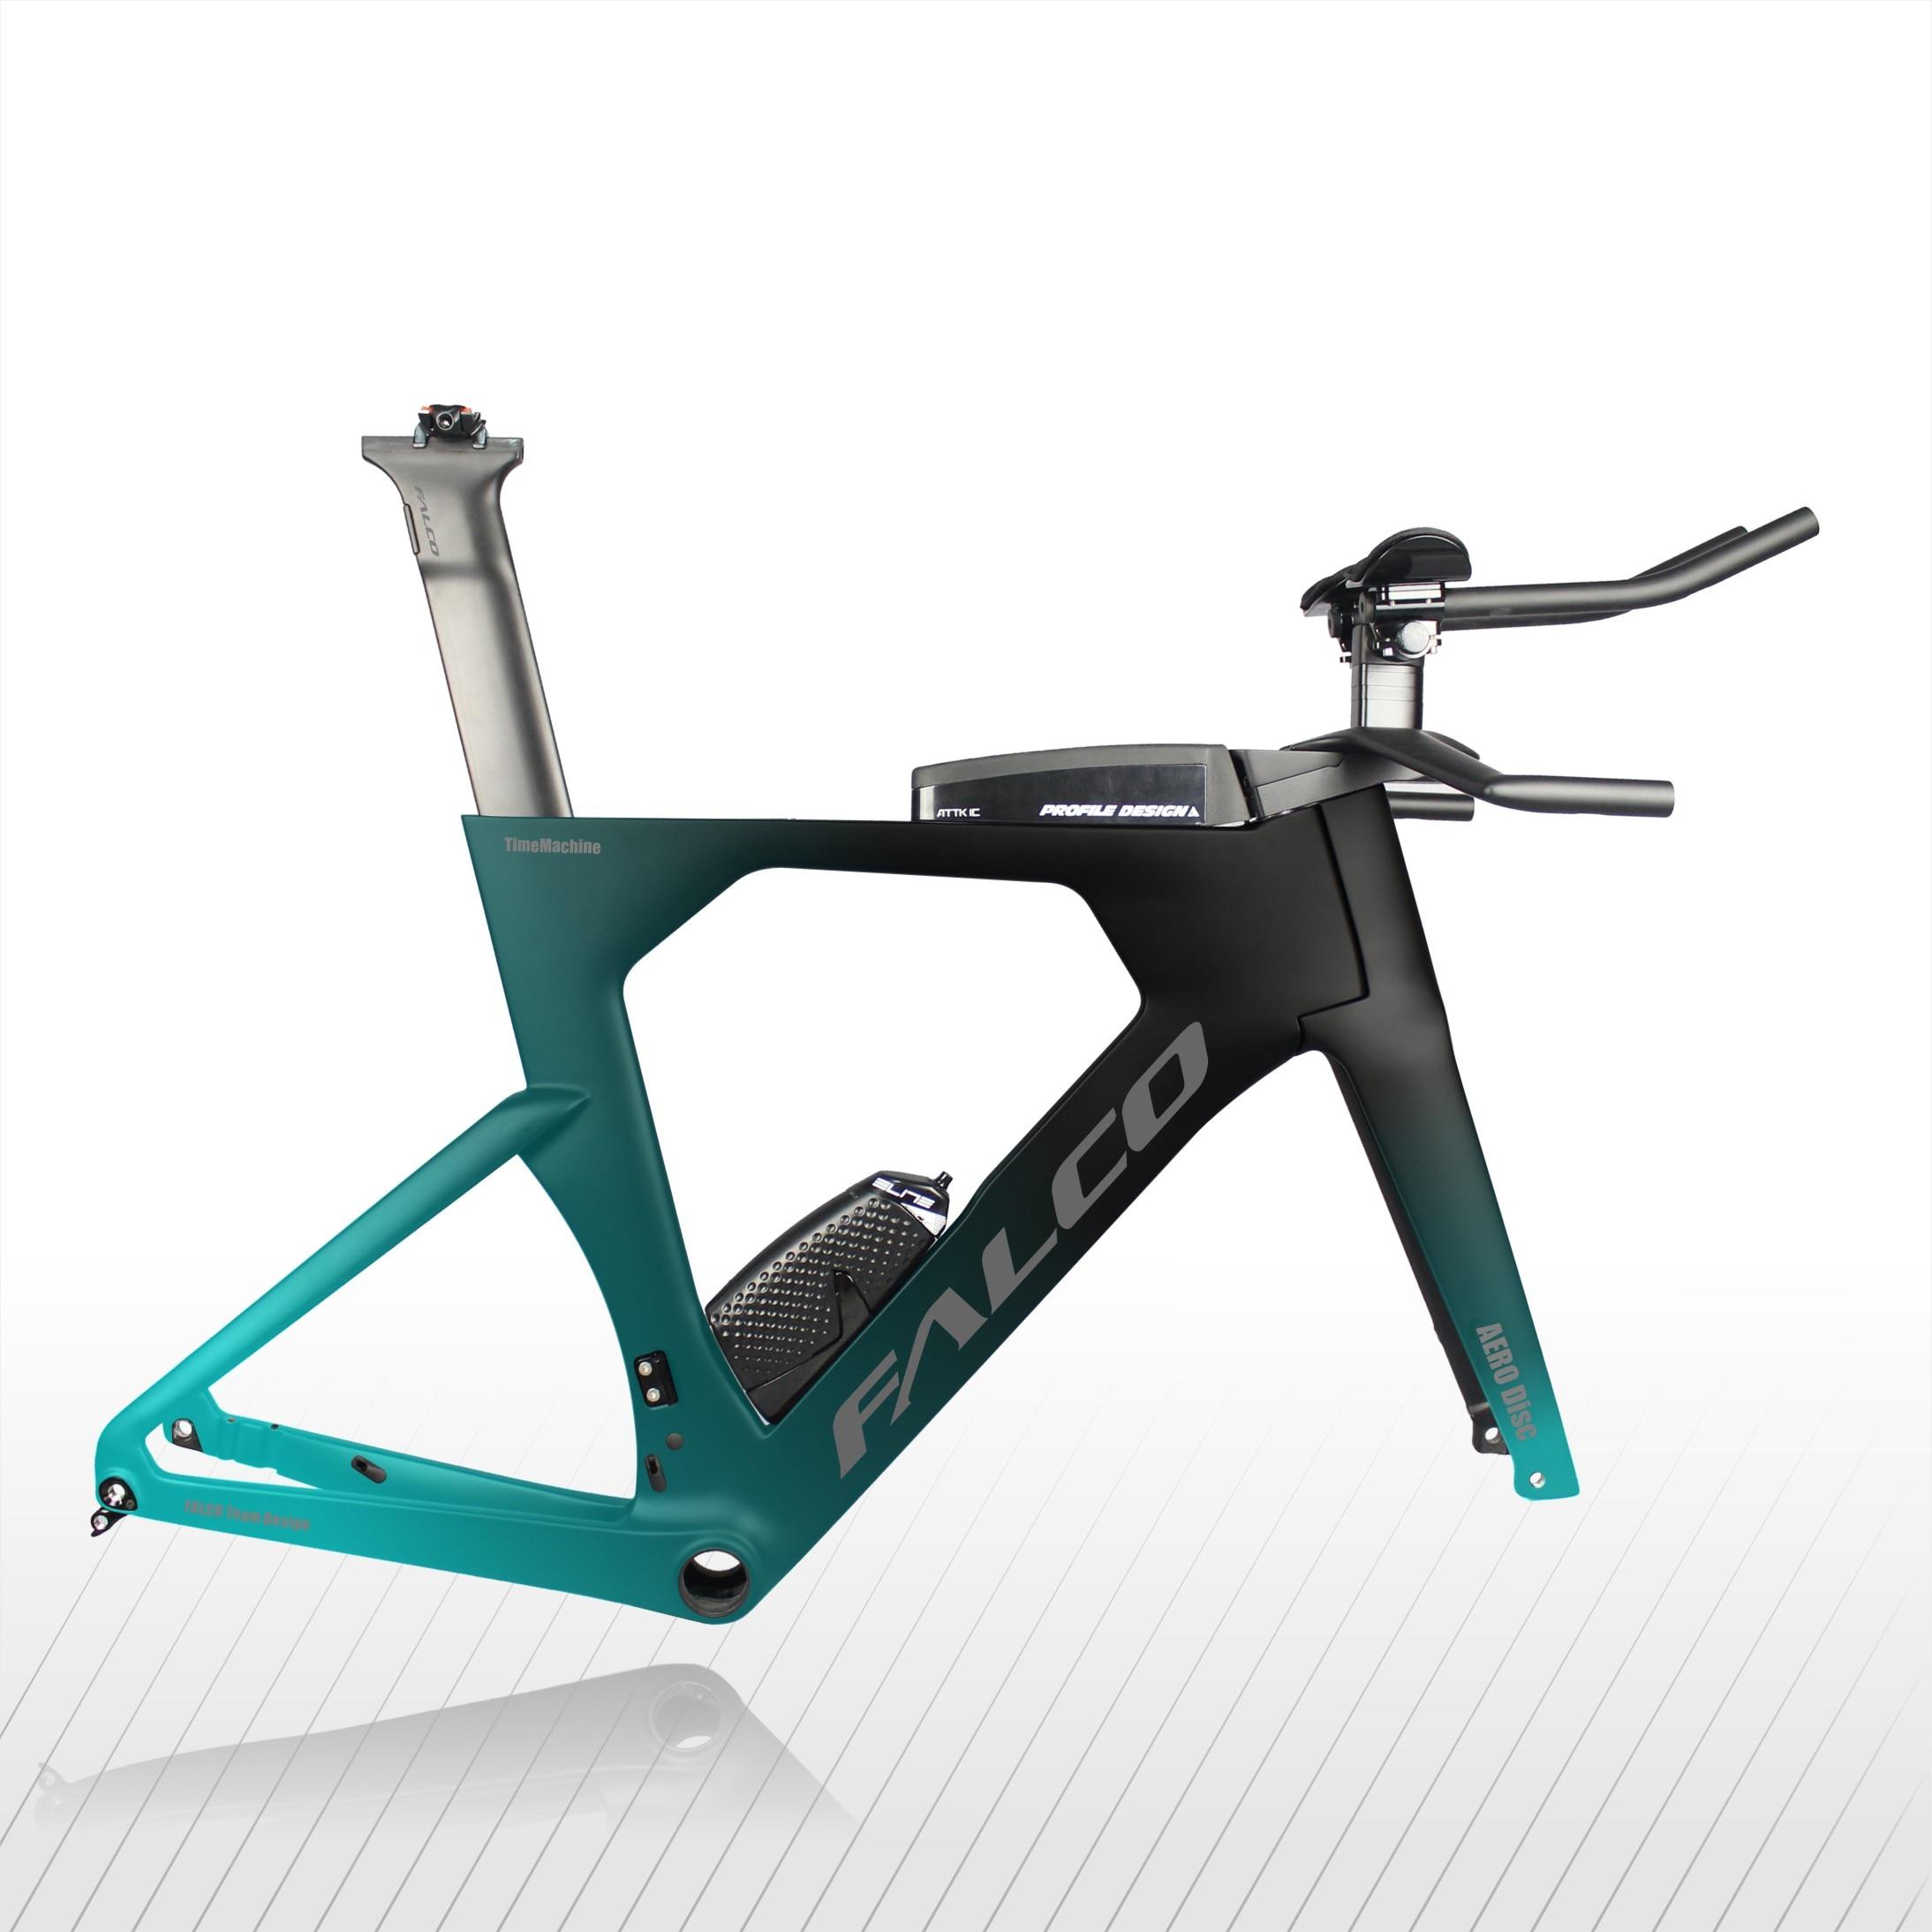 2020 Top Best FALCO 912 Disc Triathlon Bike Frame Carbon Time Trial TT Frame 48 52 54 56 58cm